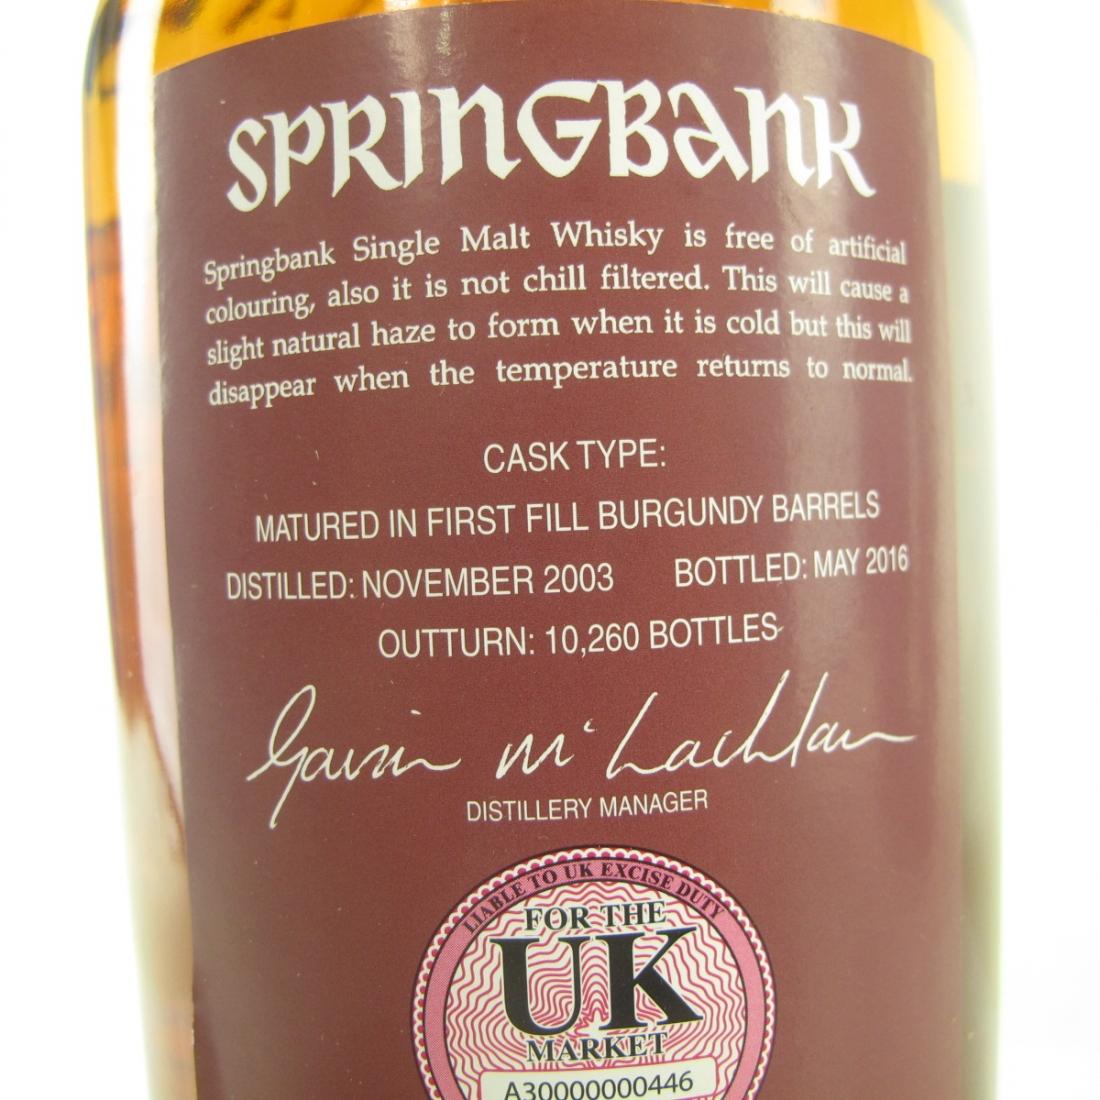 Springbank 2003 Burgundy Wood 12 Year Old